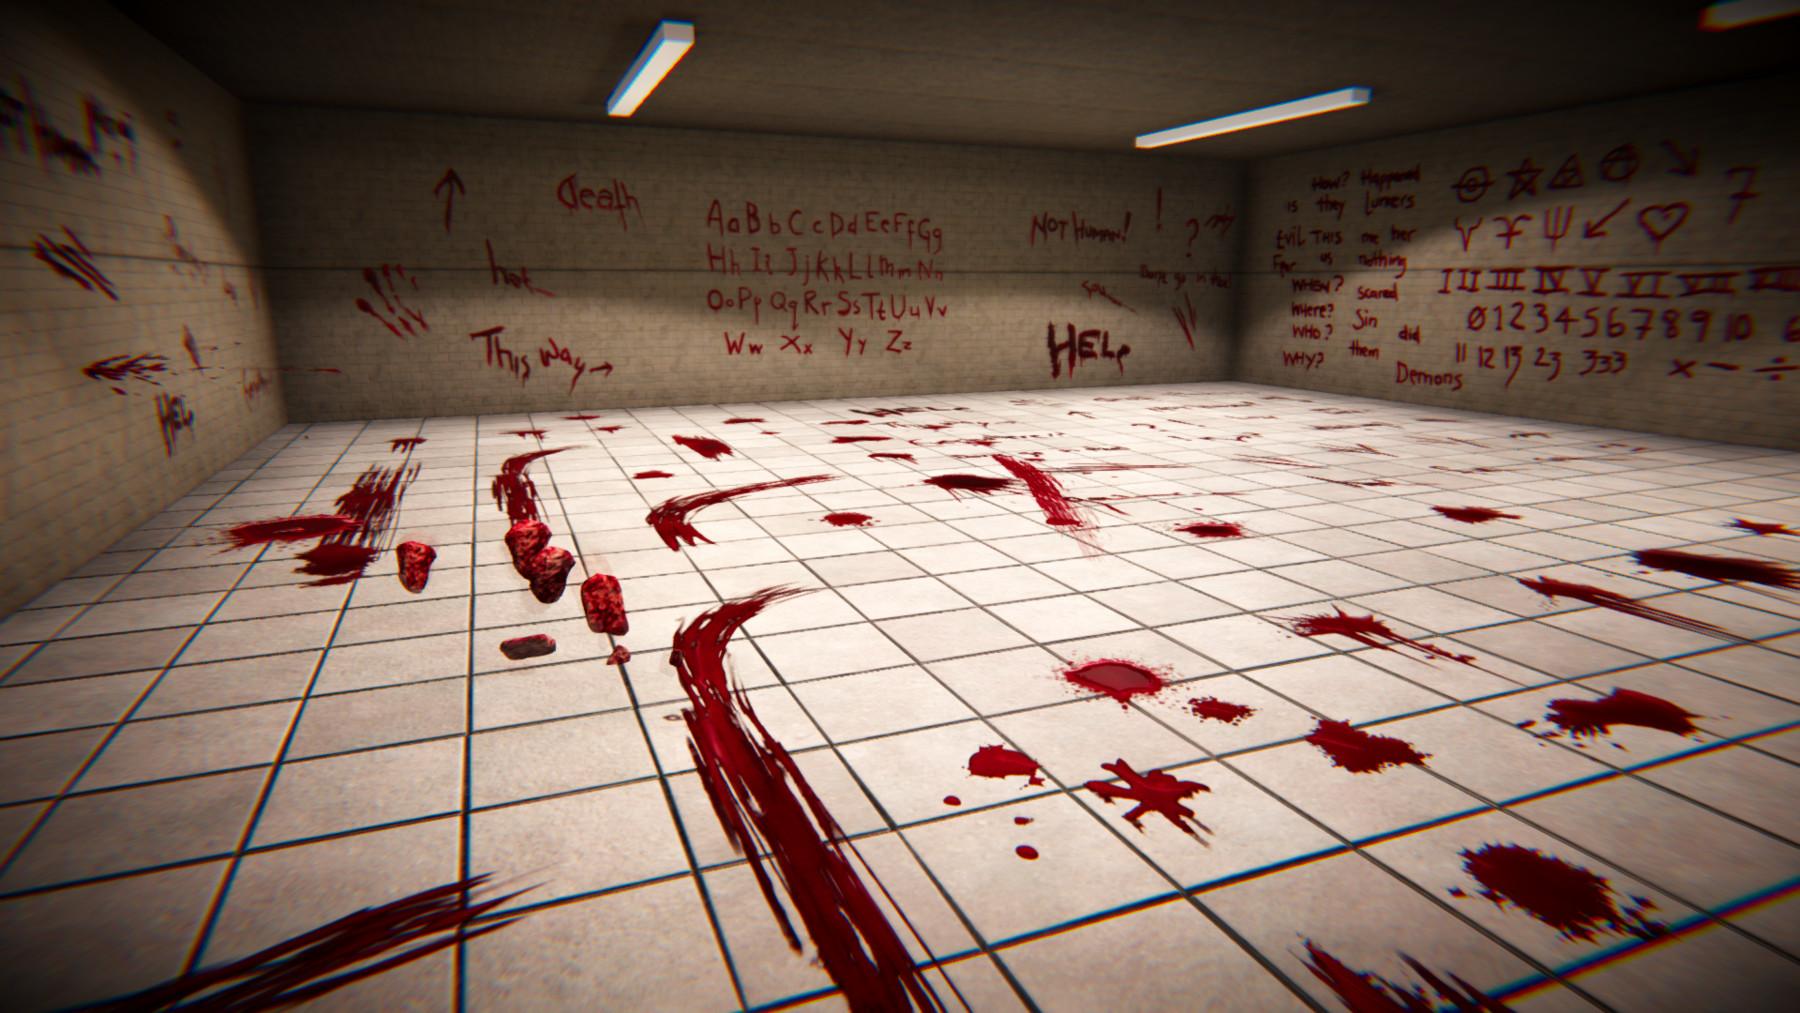 Robert Ramsay - Blood Decals - Textures and Blood Text